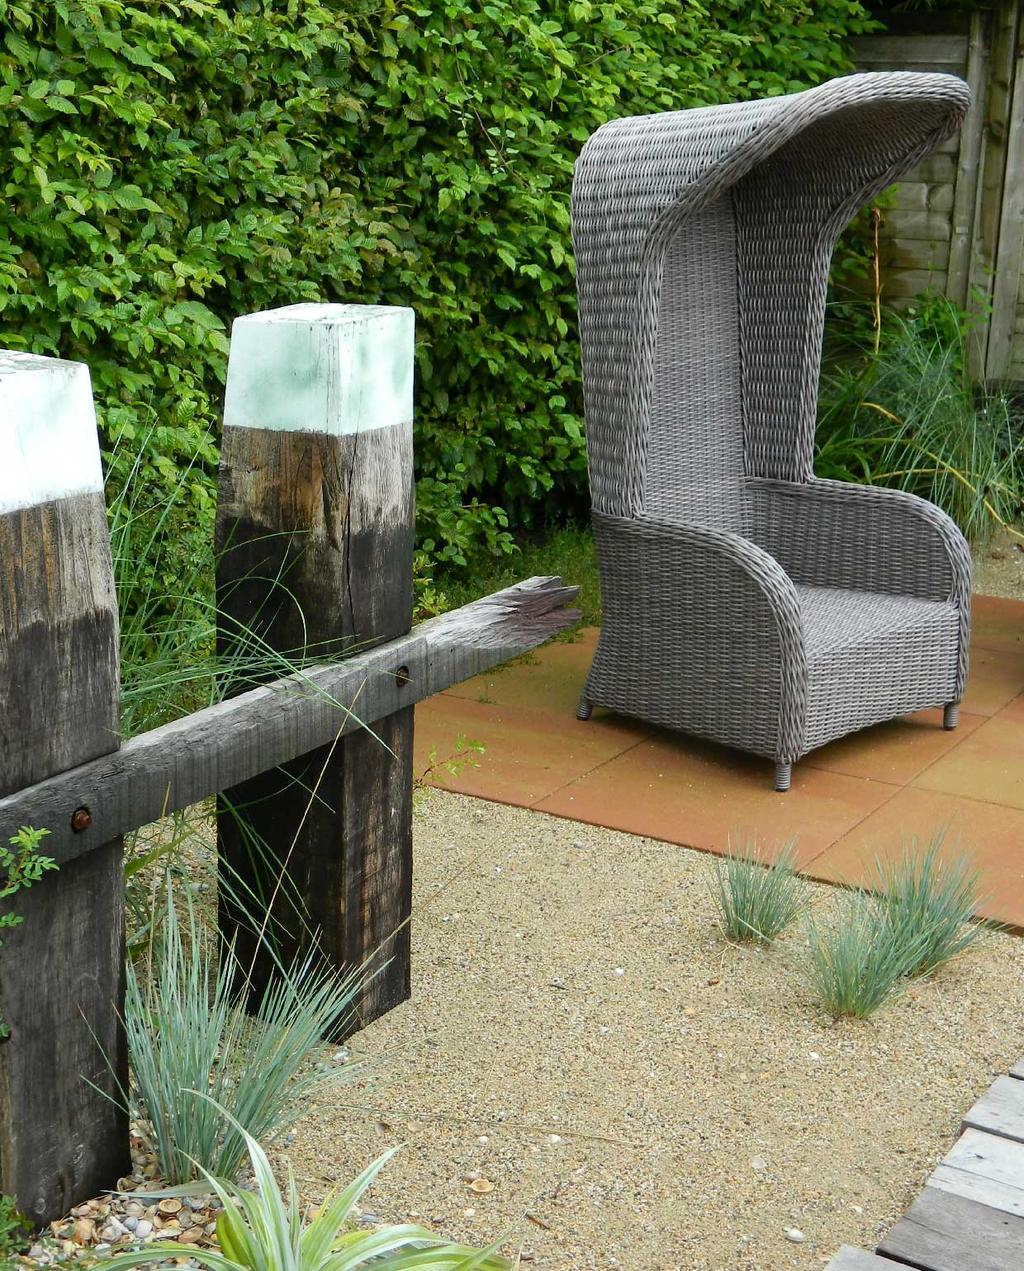 vtwonen blog kristel | minder tegels meer tuin strandtuin met zand en strandstoel